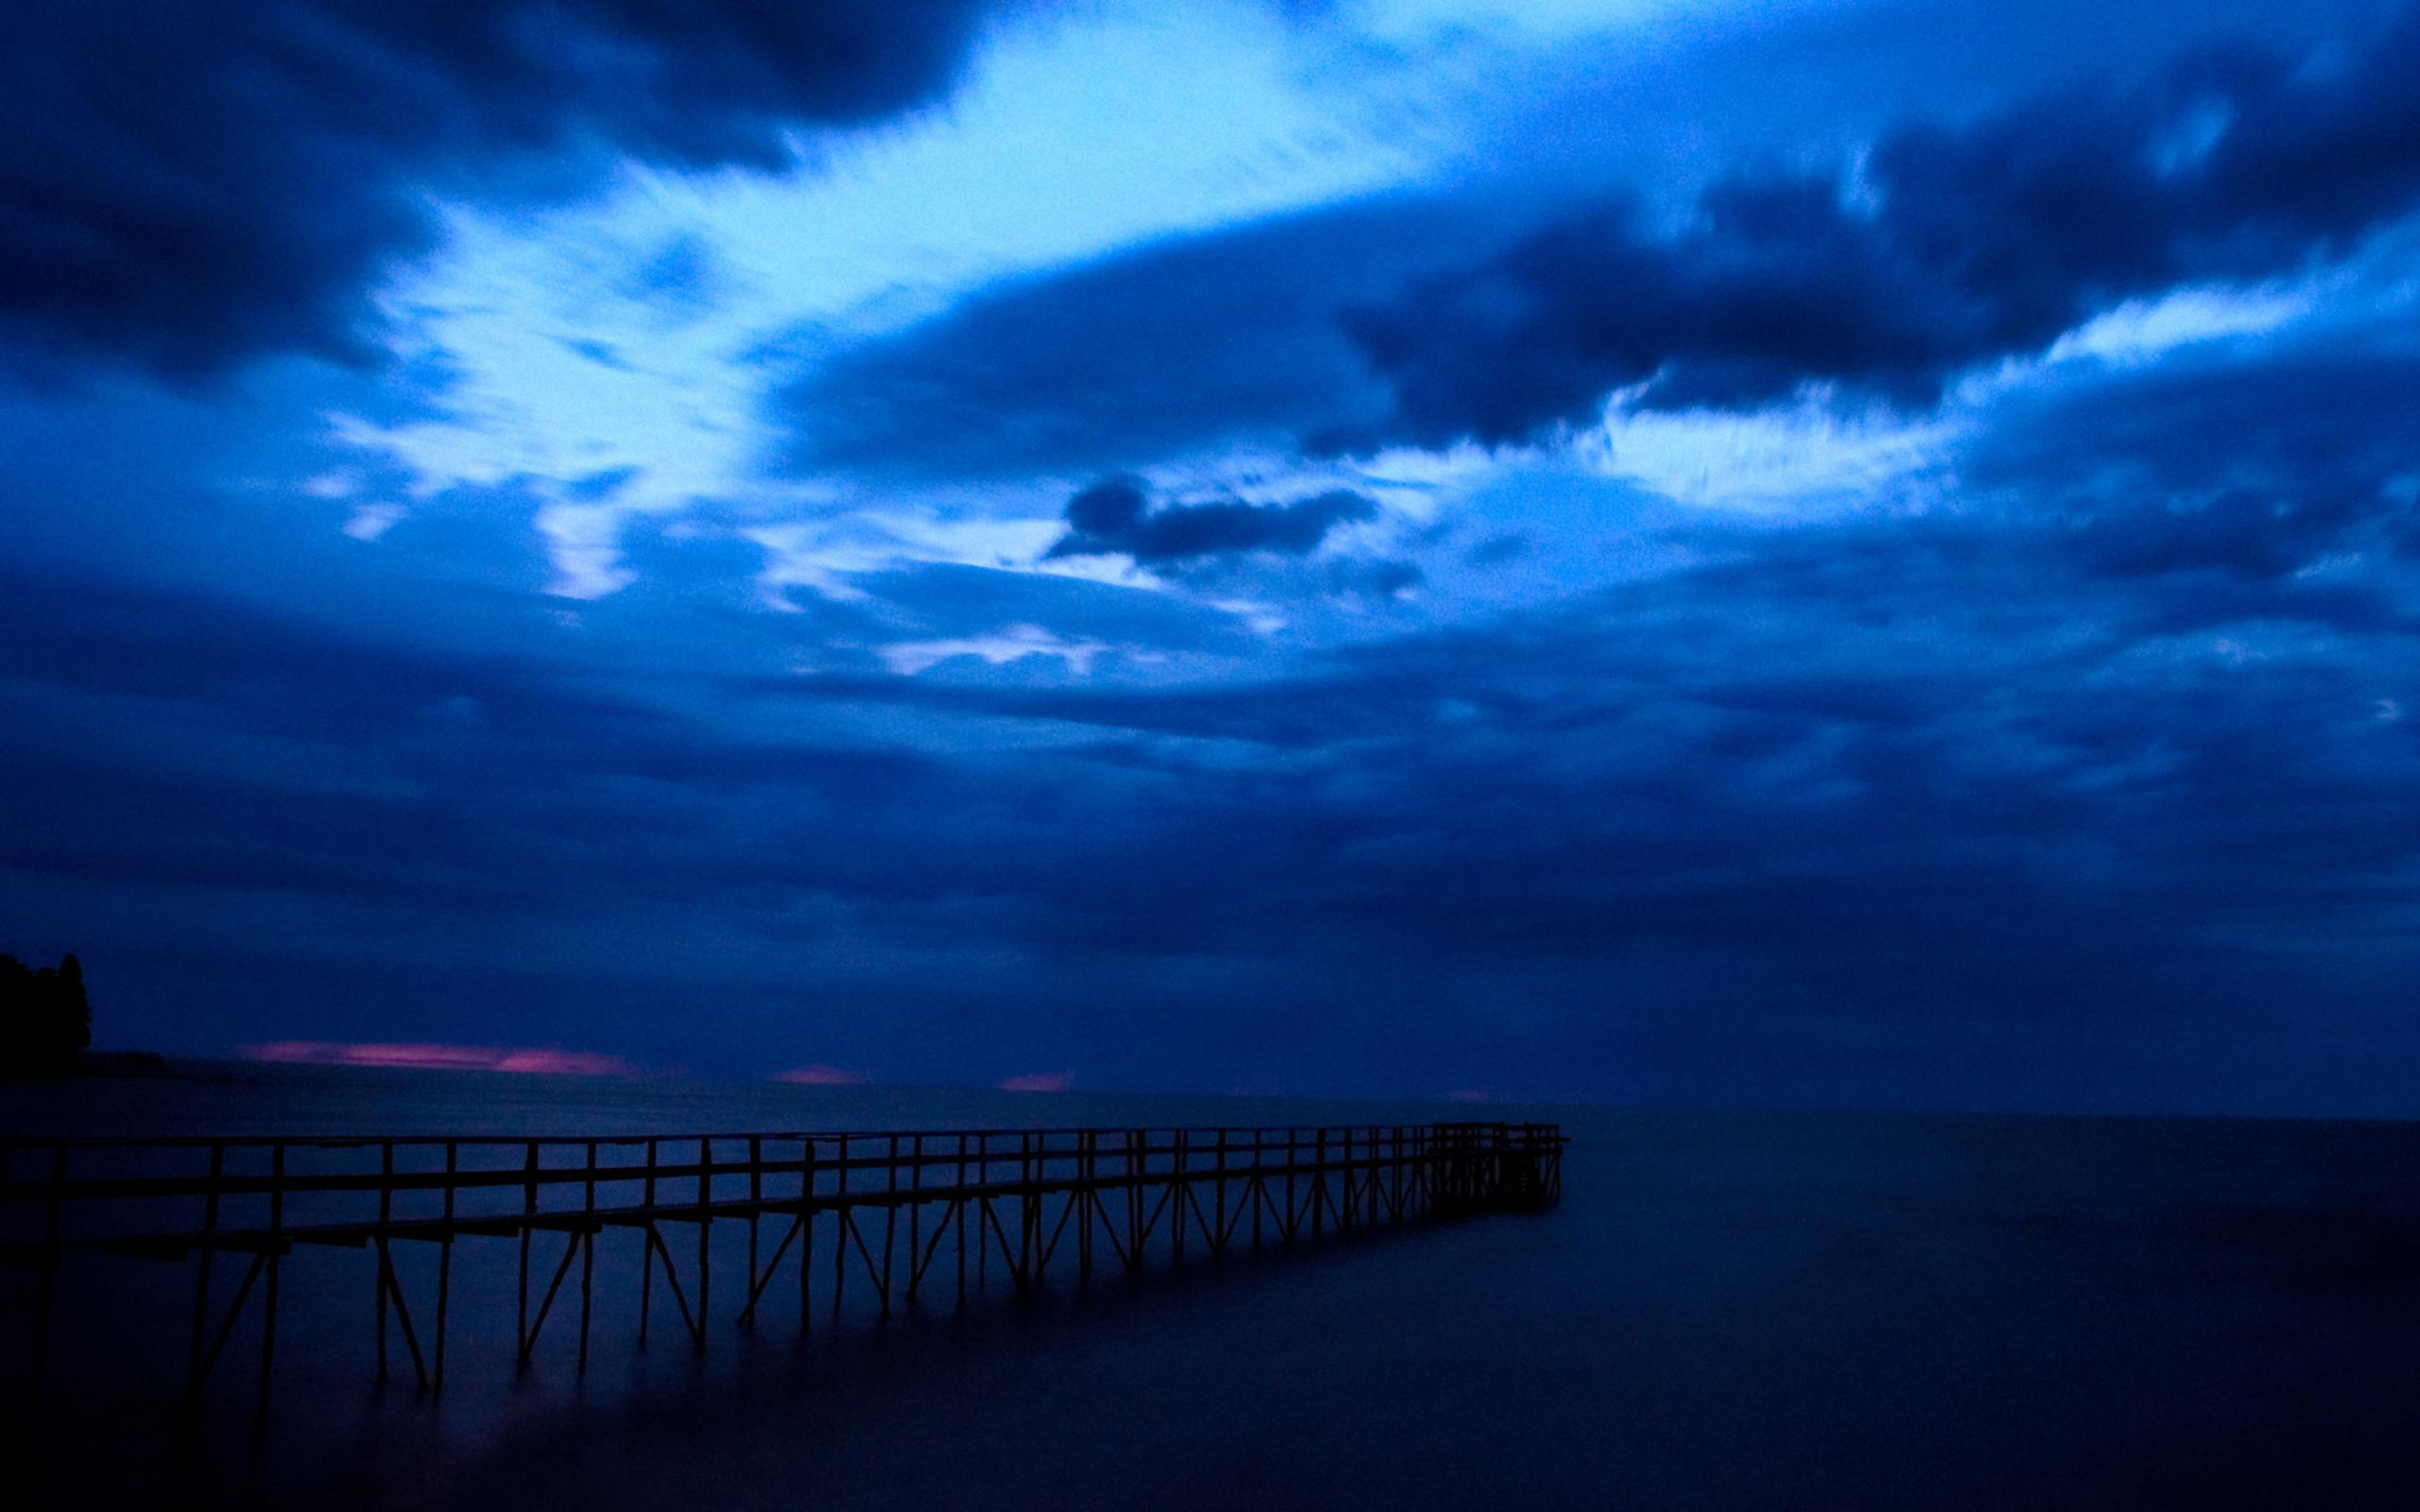 Wallpaper clouds lake winnipeg pier sky storm sunrise desktop 2560x1600